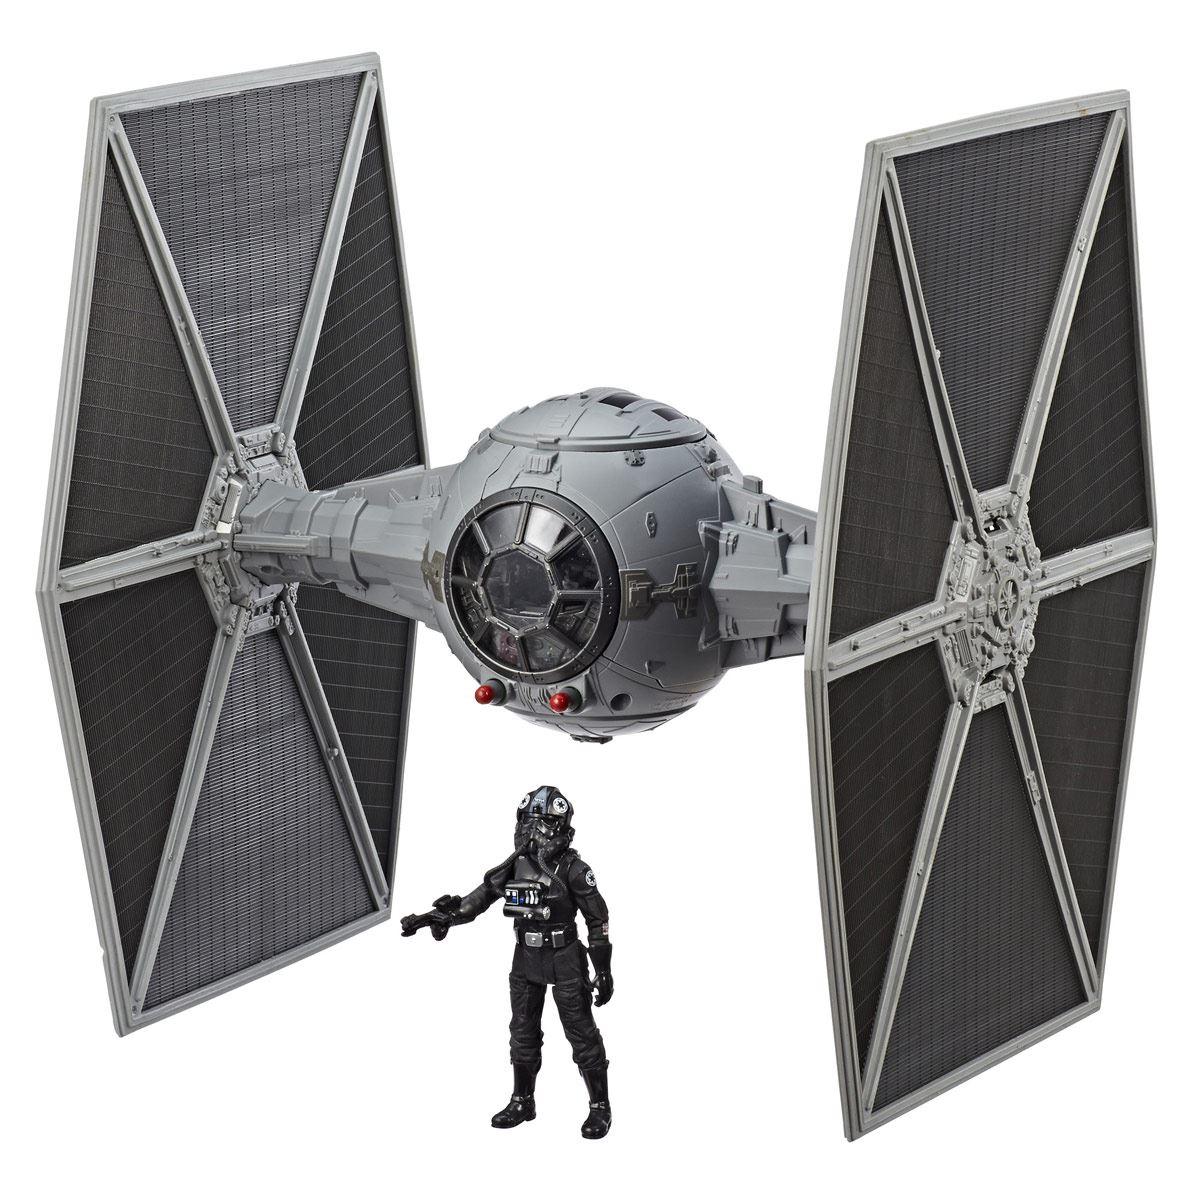 Figura tie fighter pilot y tie fighter force link 2.0 star wars  - Sanborns